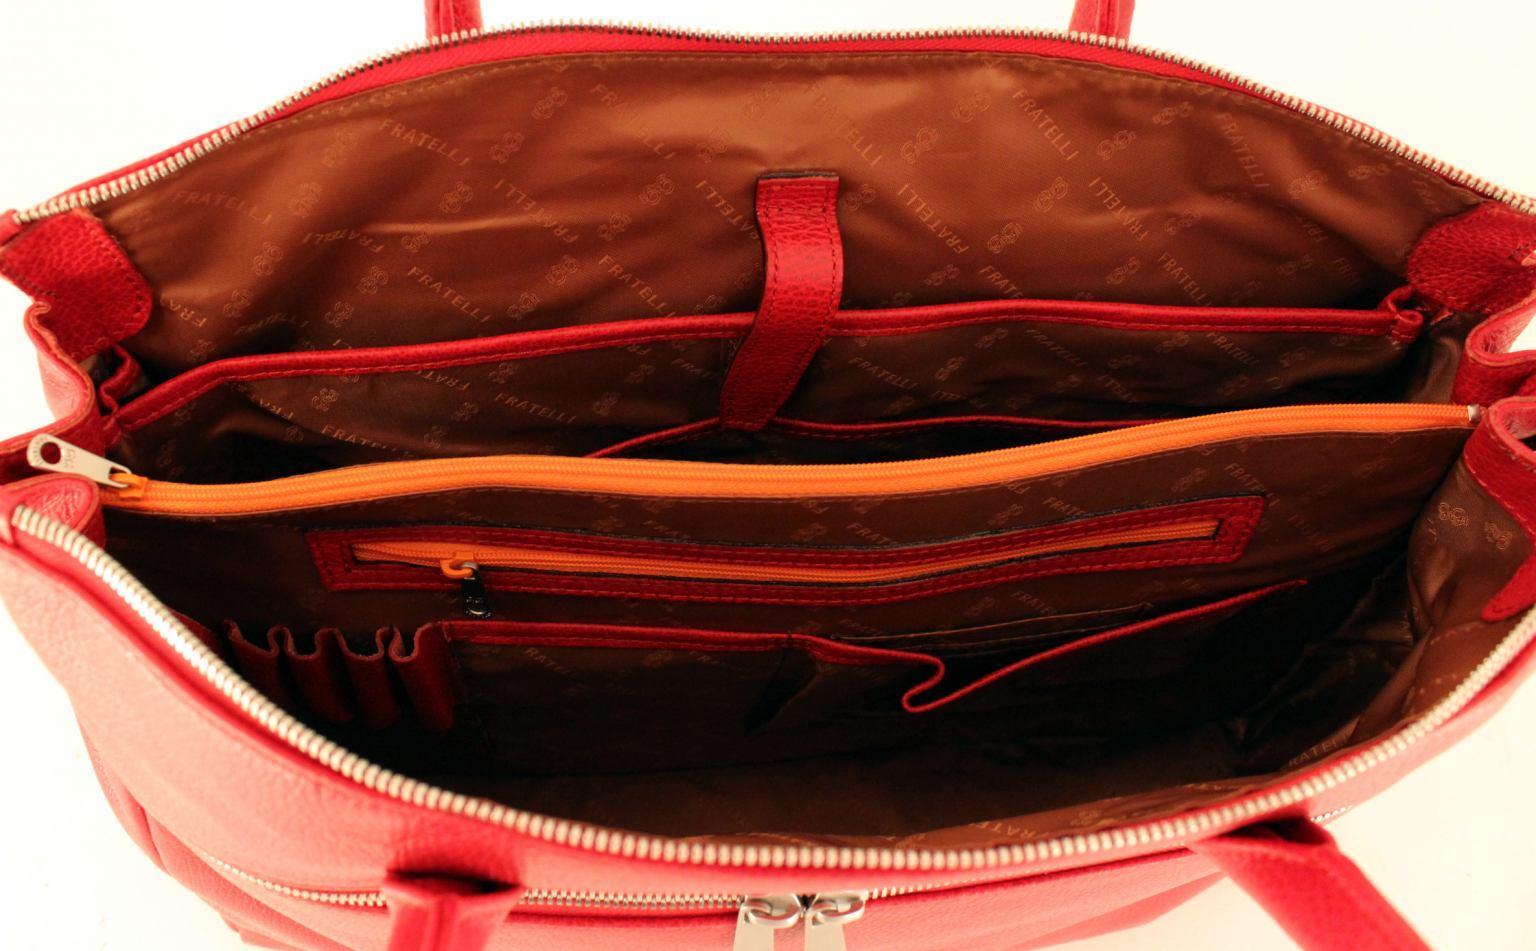 bb220613279be GiGi Fratelli Damen Businesstasche Leder Schwarz Silber - Bags   more